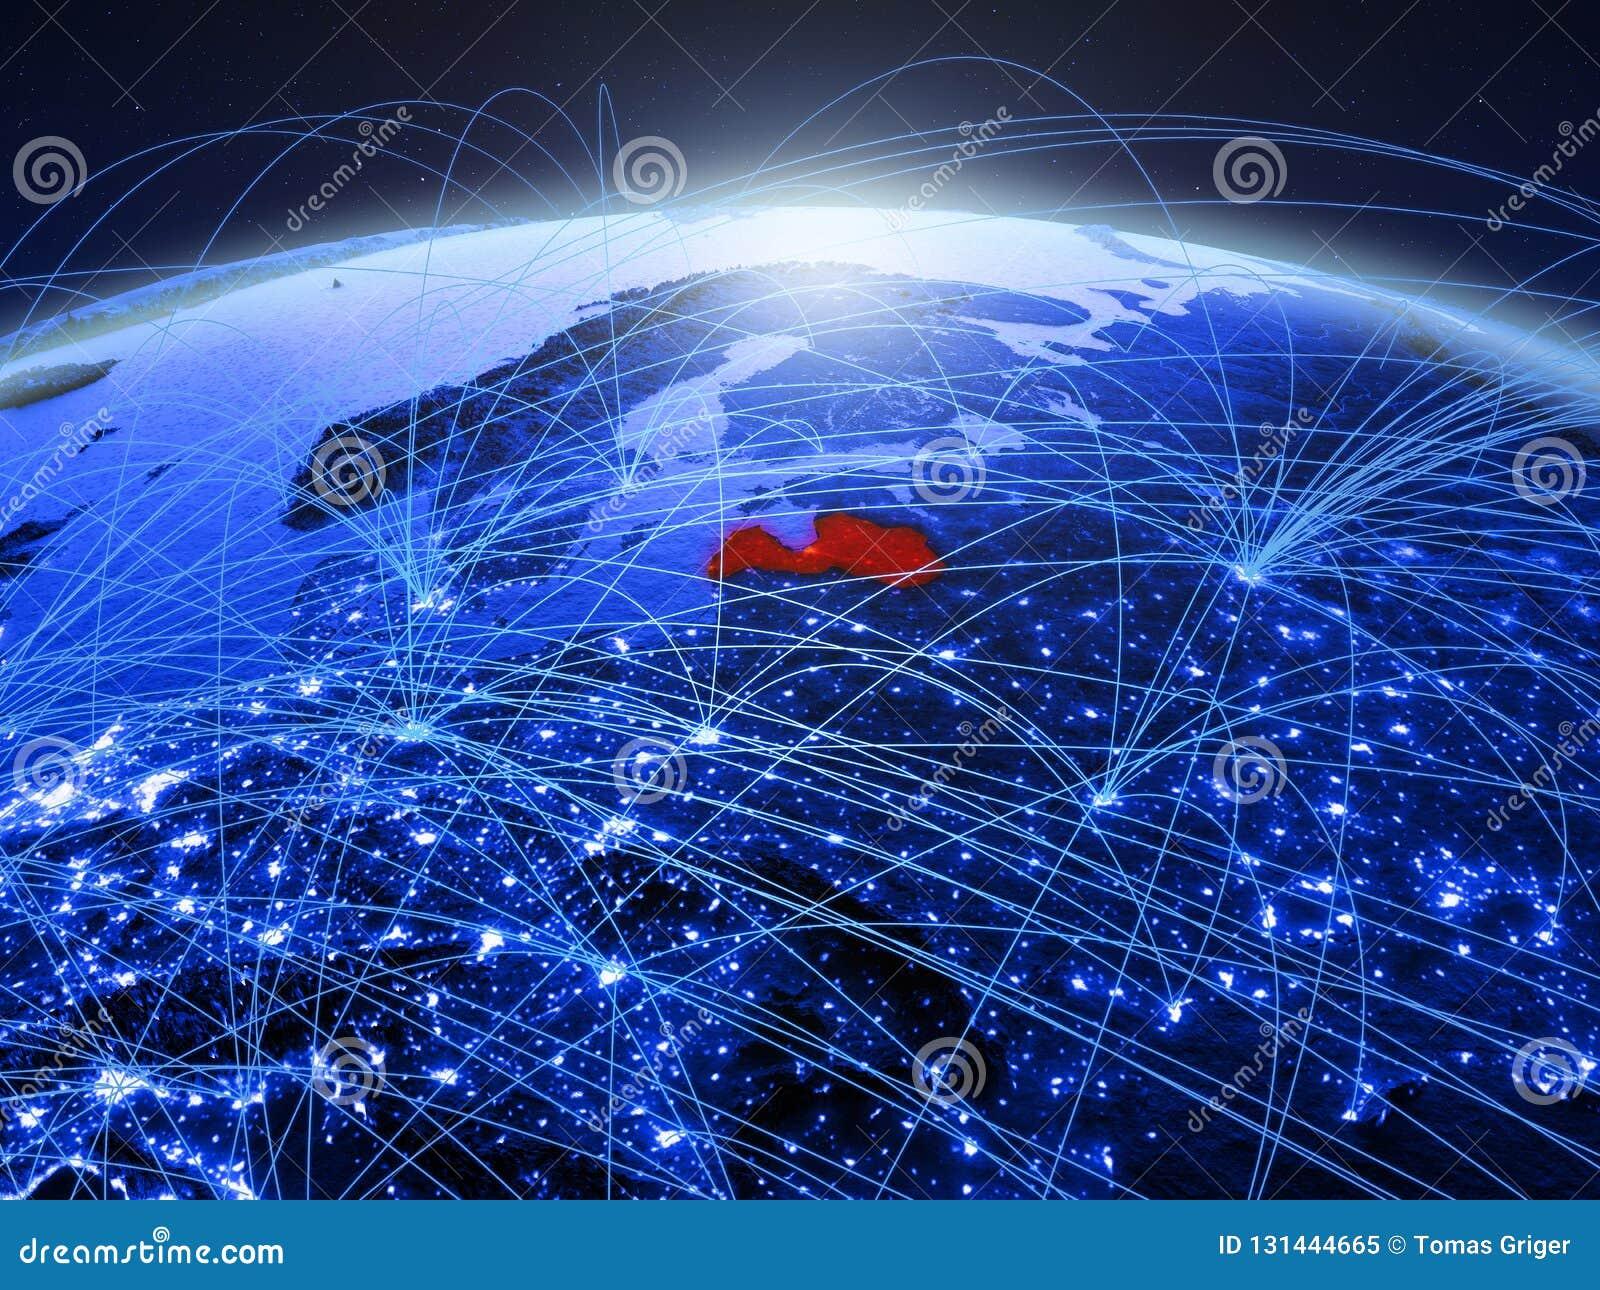 Letland op blauwe digitale aarde met internationaal netwerk die mededeling, reis en verbindingen vertegenwoordigen 3D Illustratie